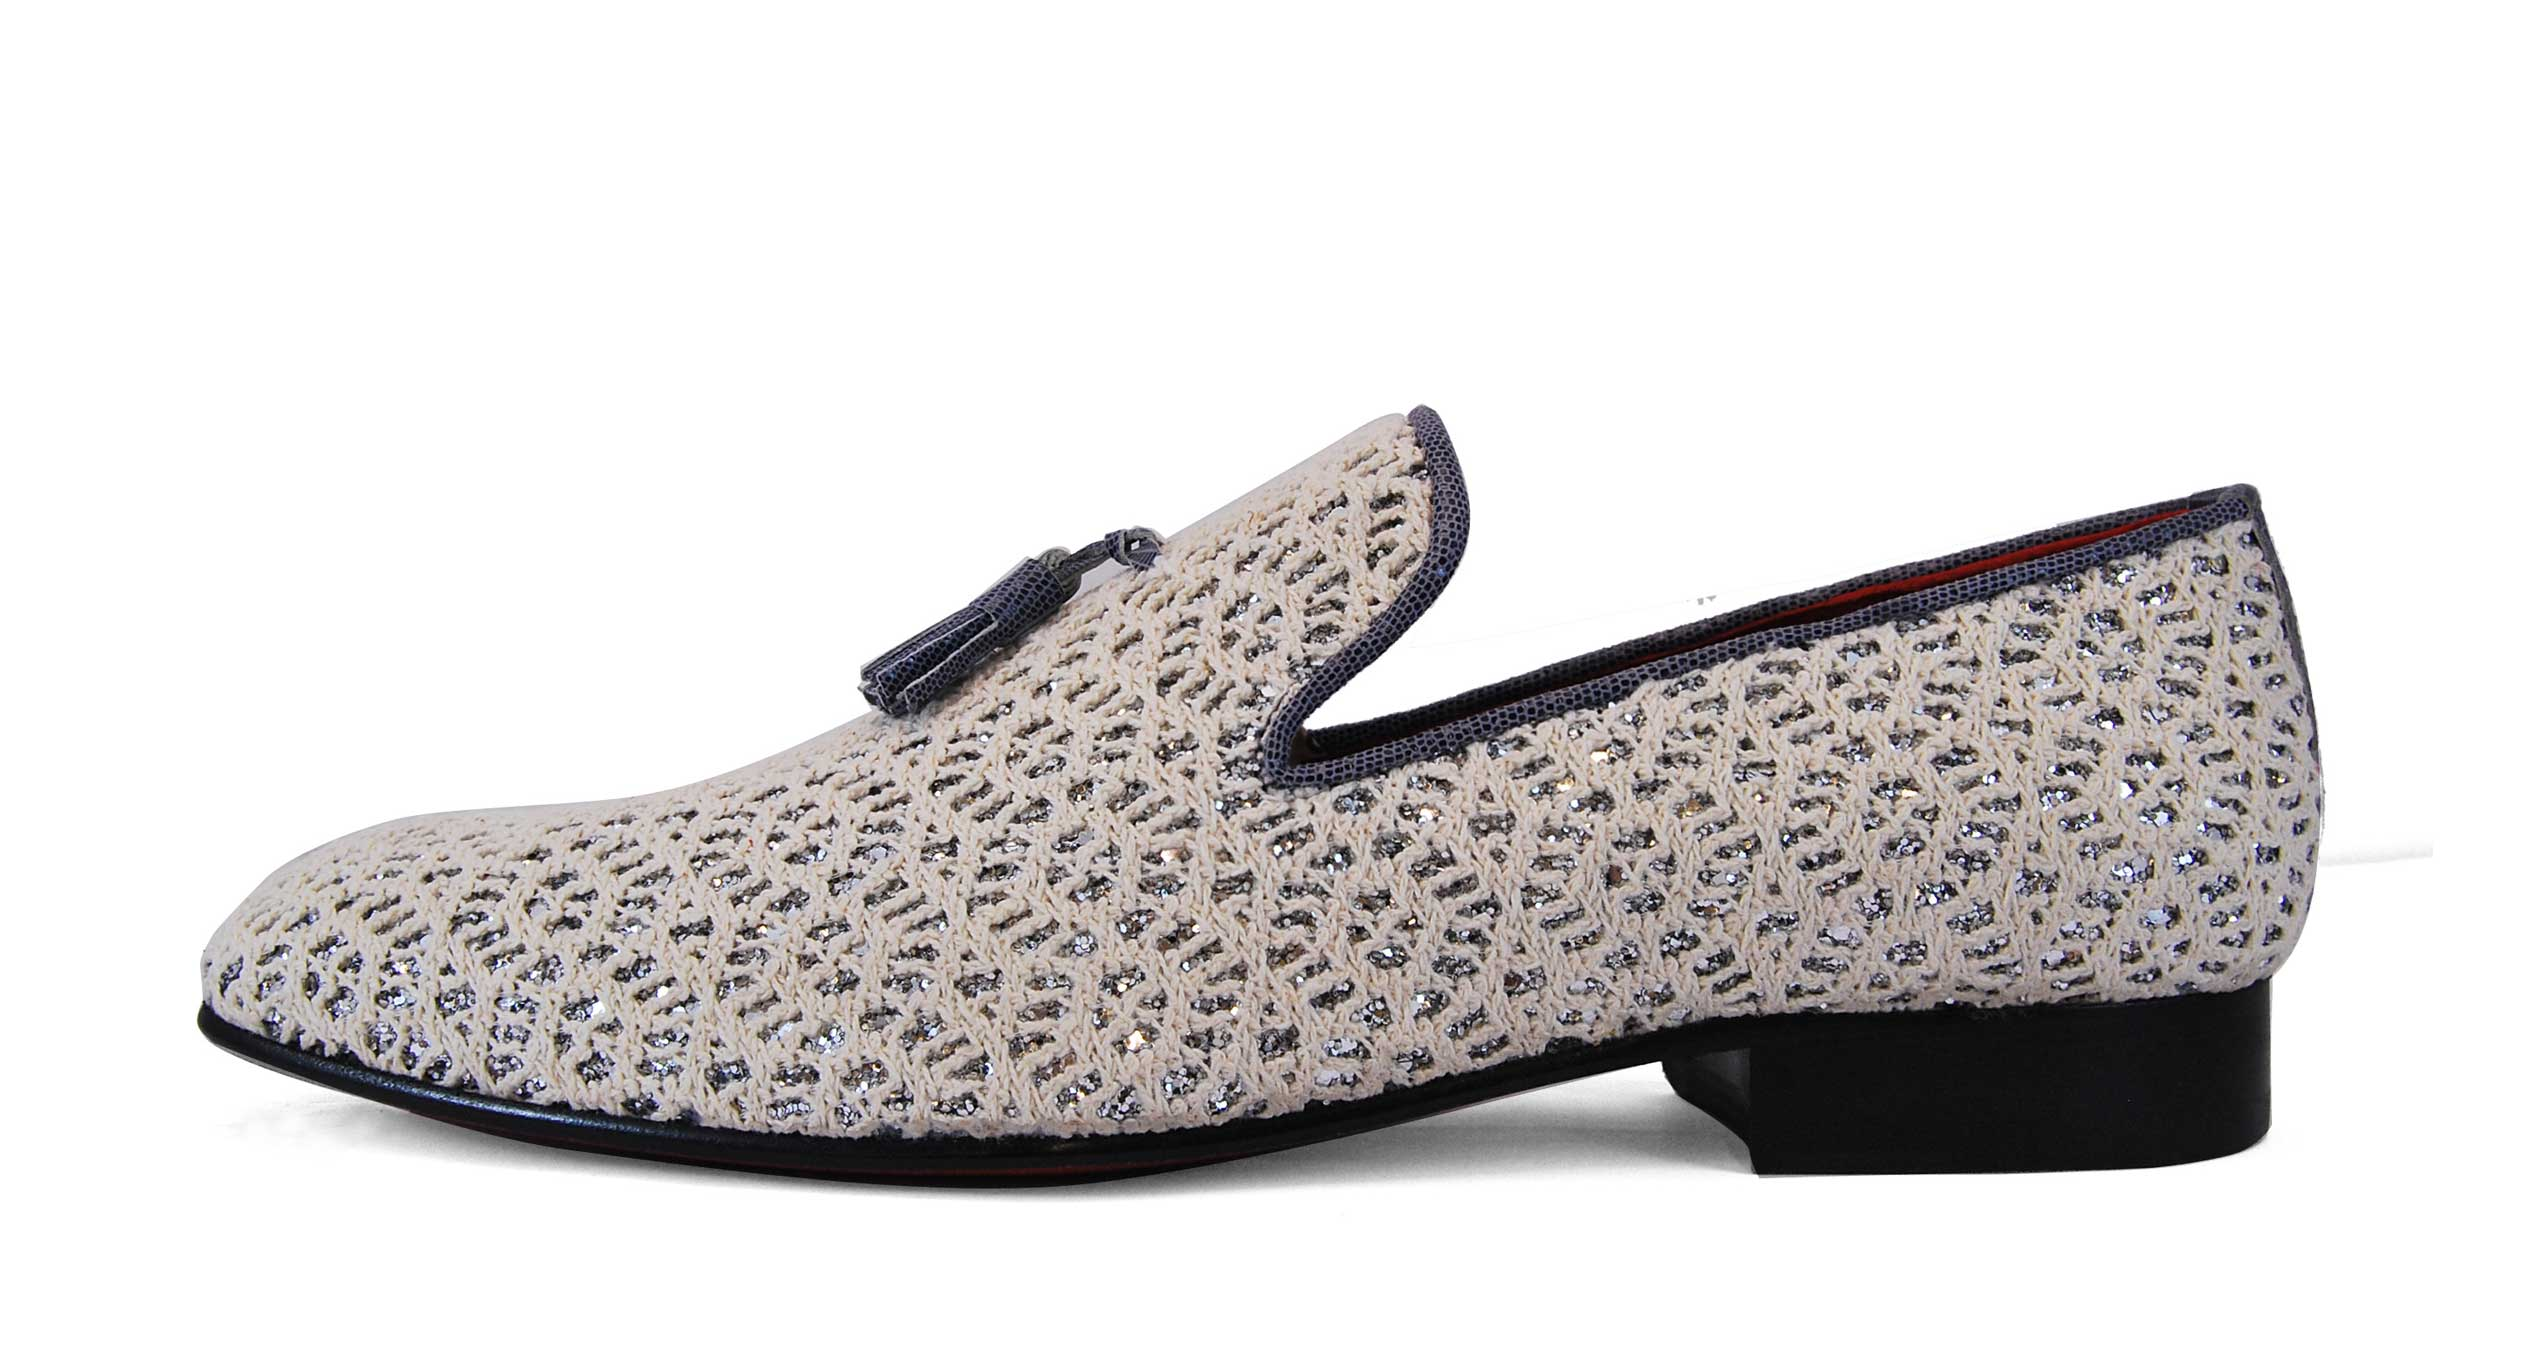 Foto 1 de Zapato Blanco Con Borla Cuero